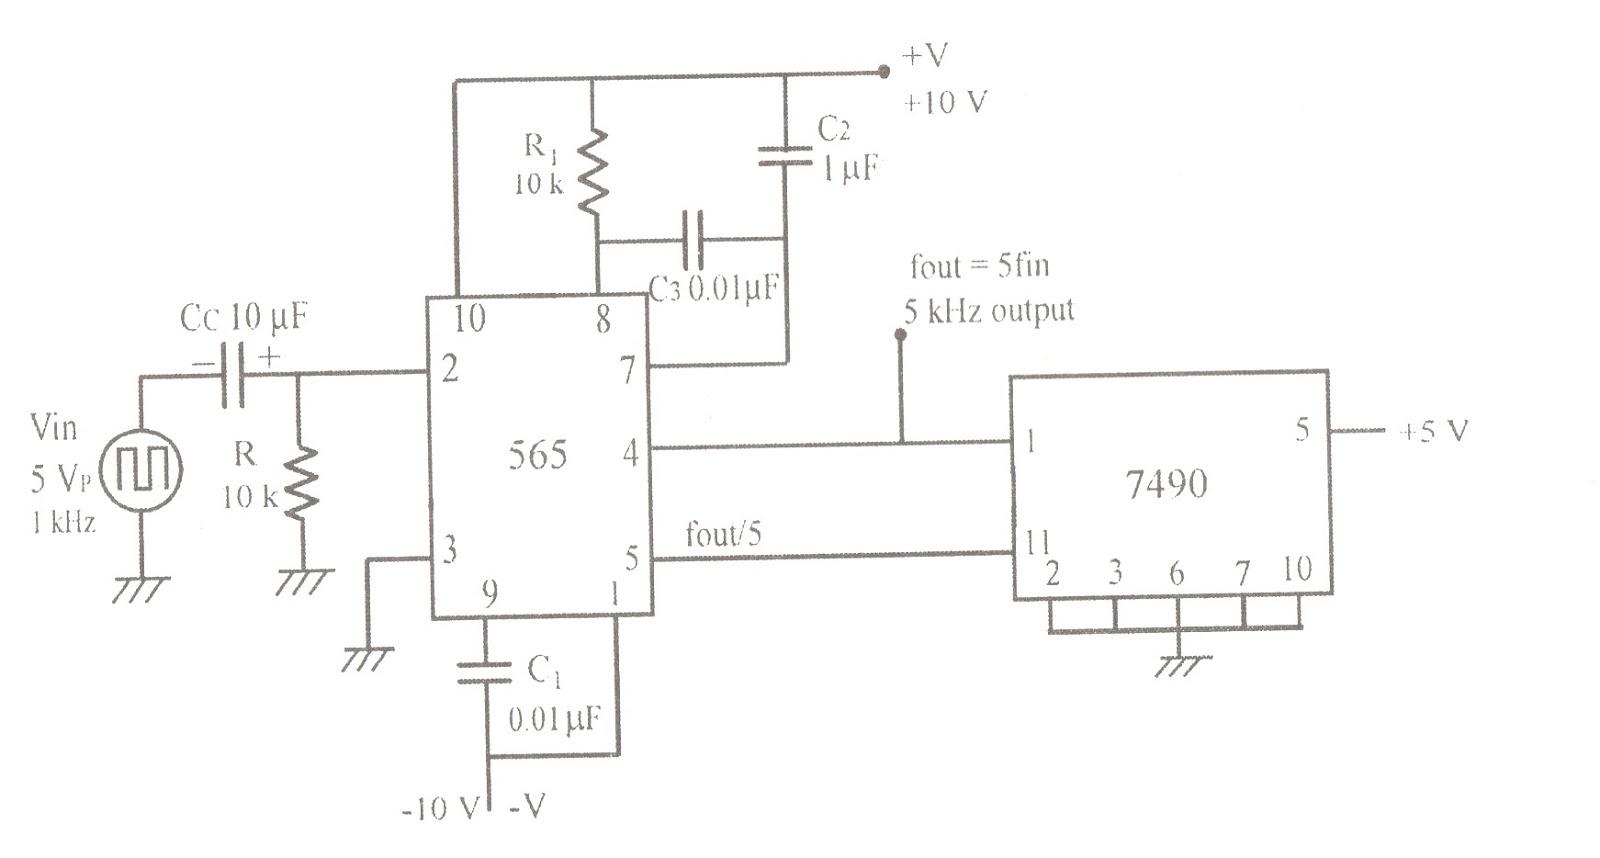 circuit diagram  [ 1600 x 858 Pixel ]